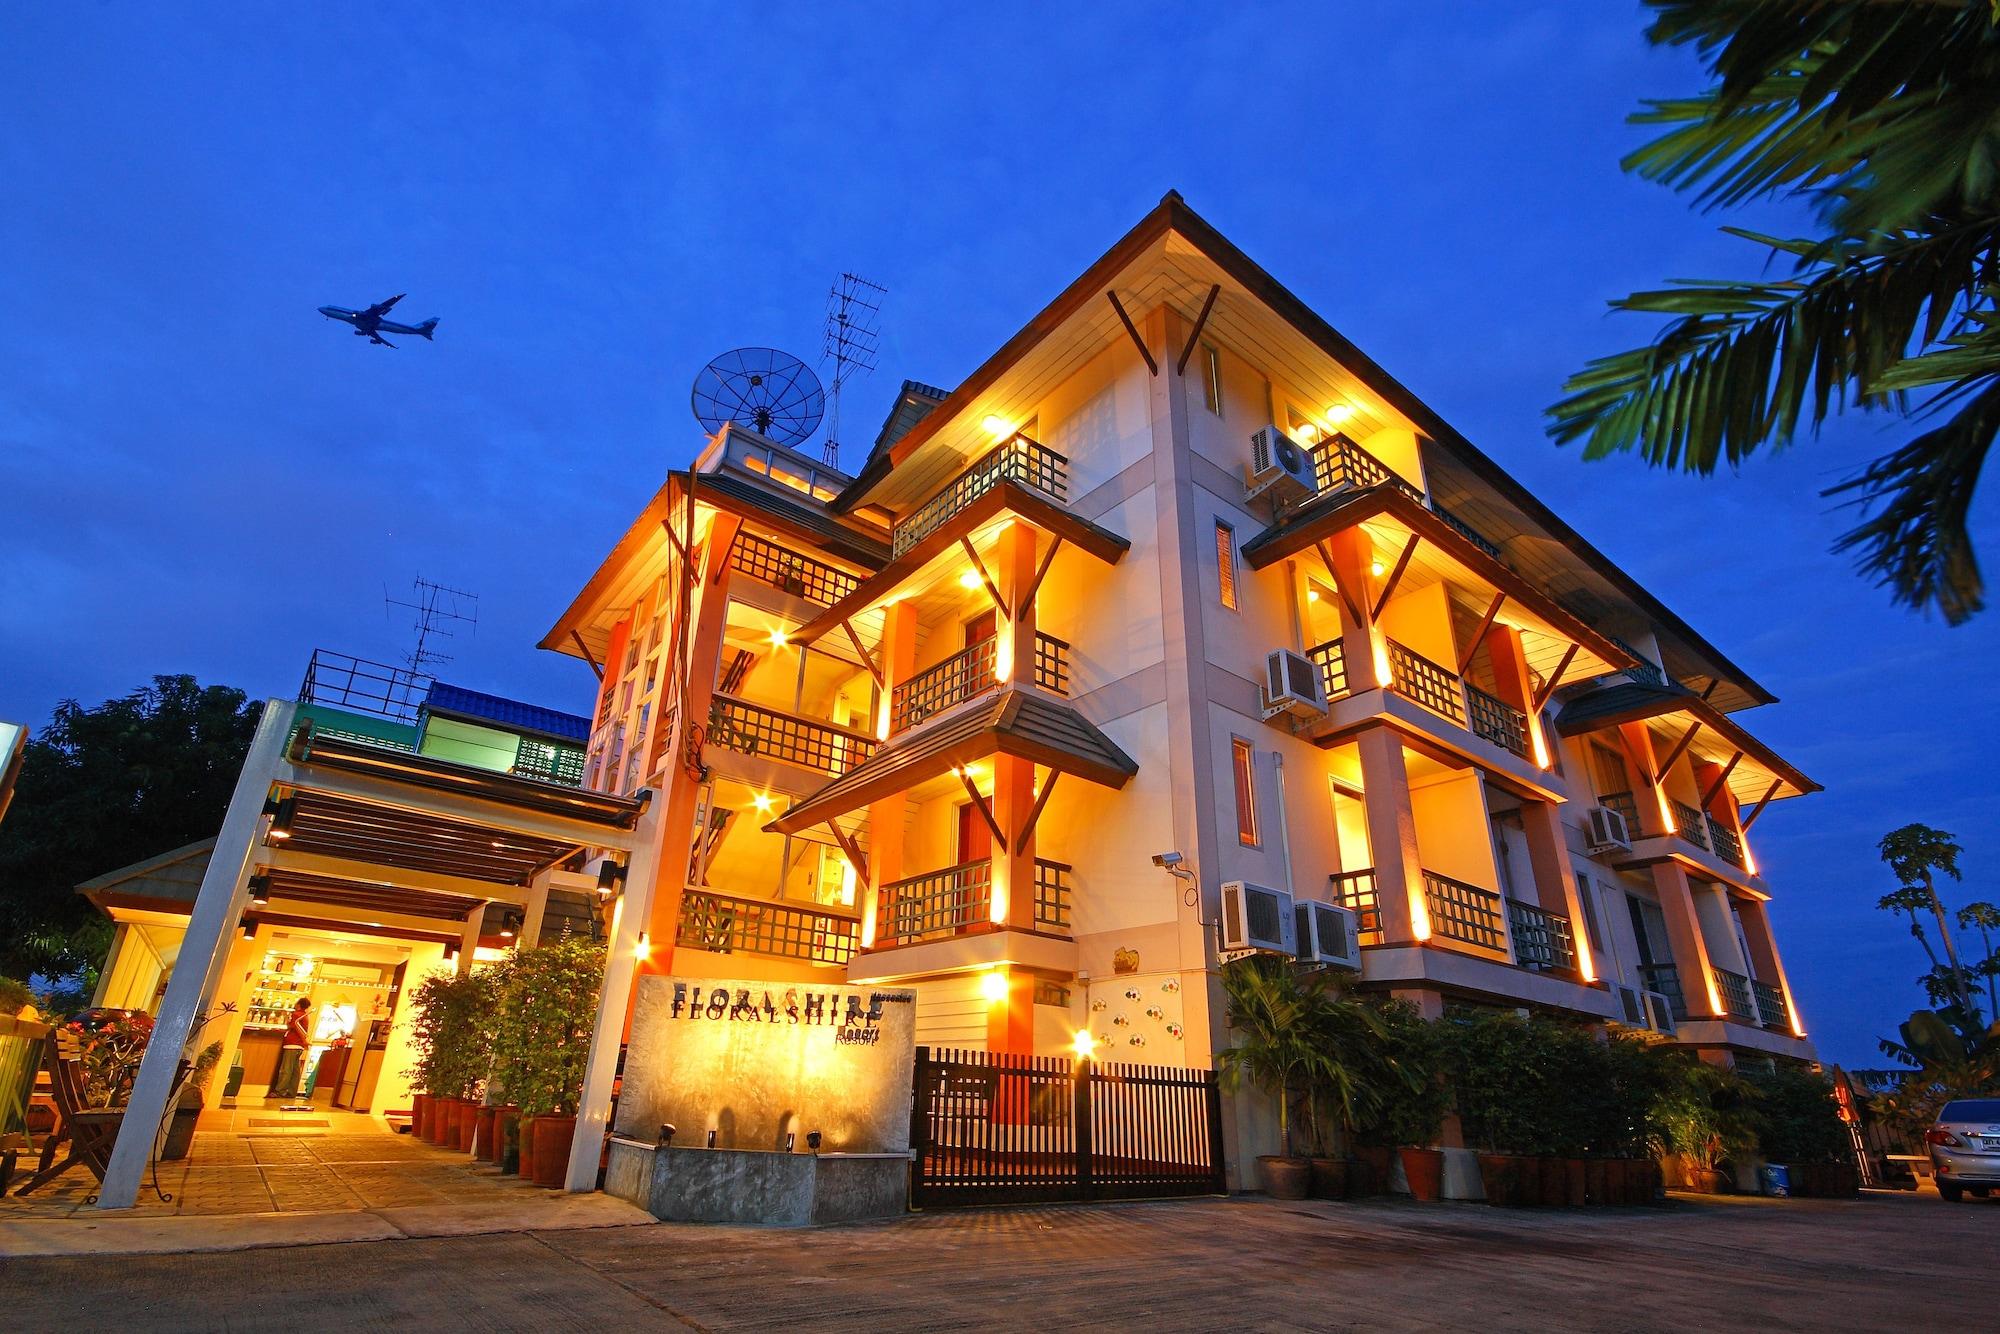 Floral Shire Resort, Lat Krabang